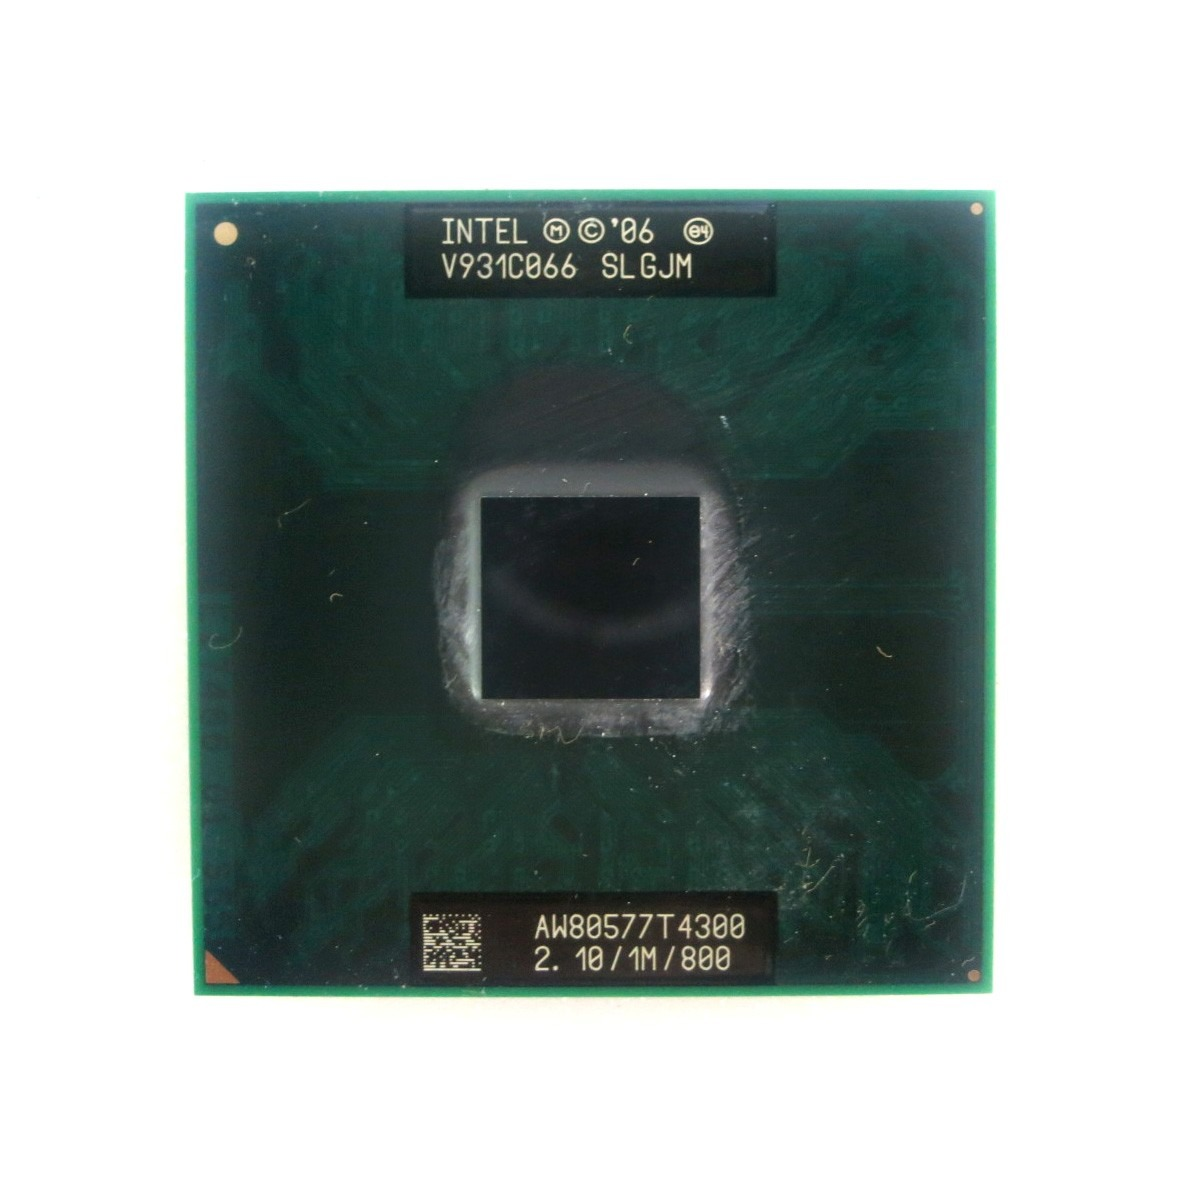 Processador Notebook Intel® Pentium T4300 SLGJM 1MB Cache 2.10Ghz